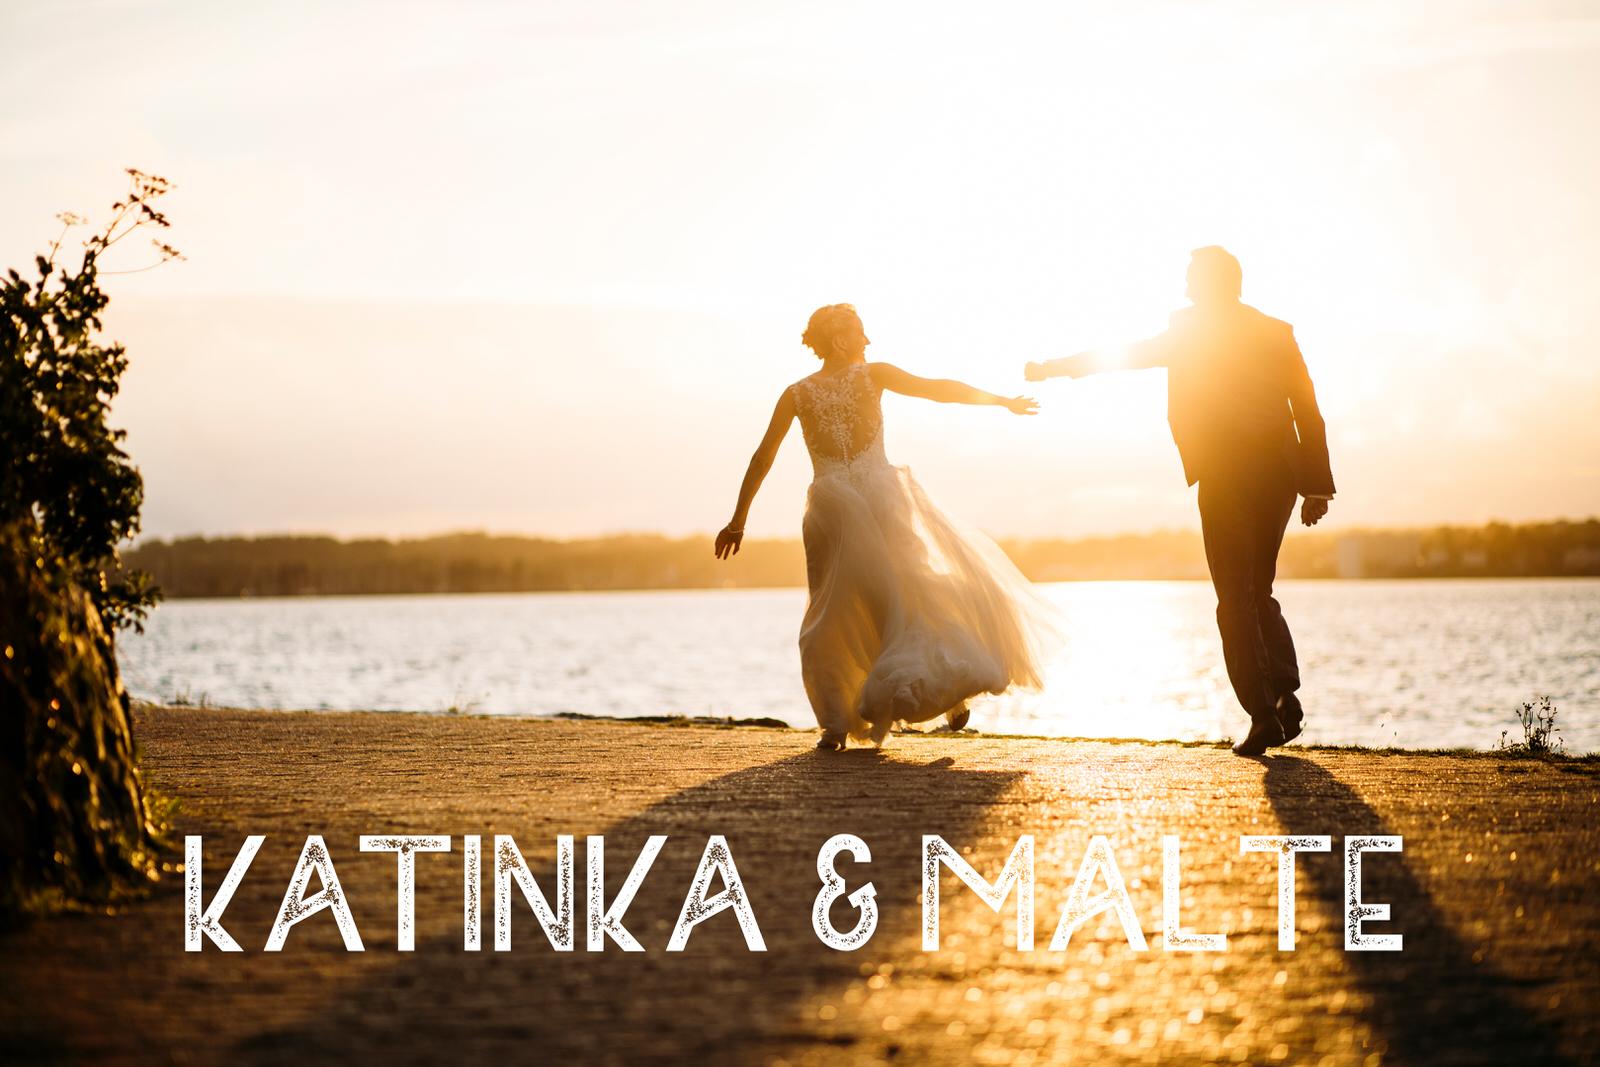 Katinka & Malte